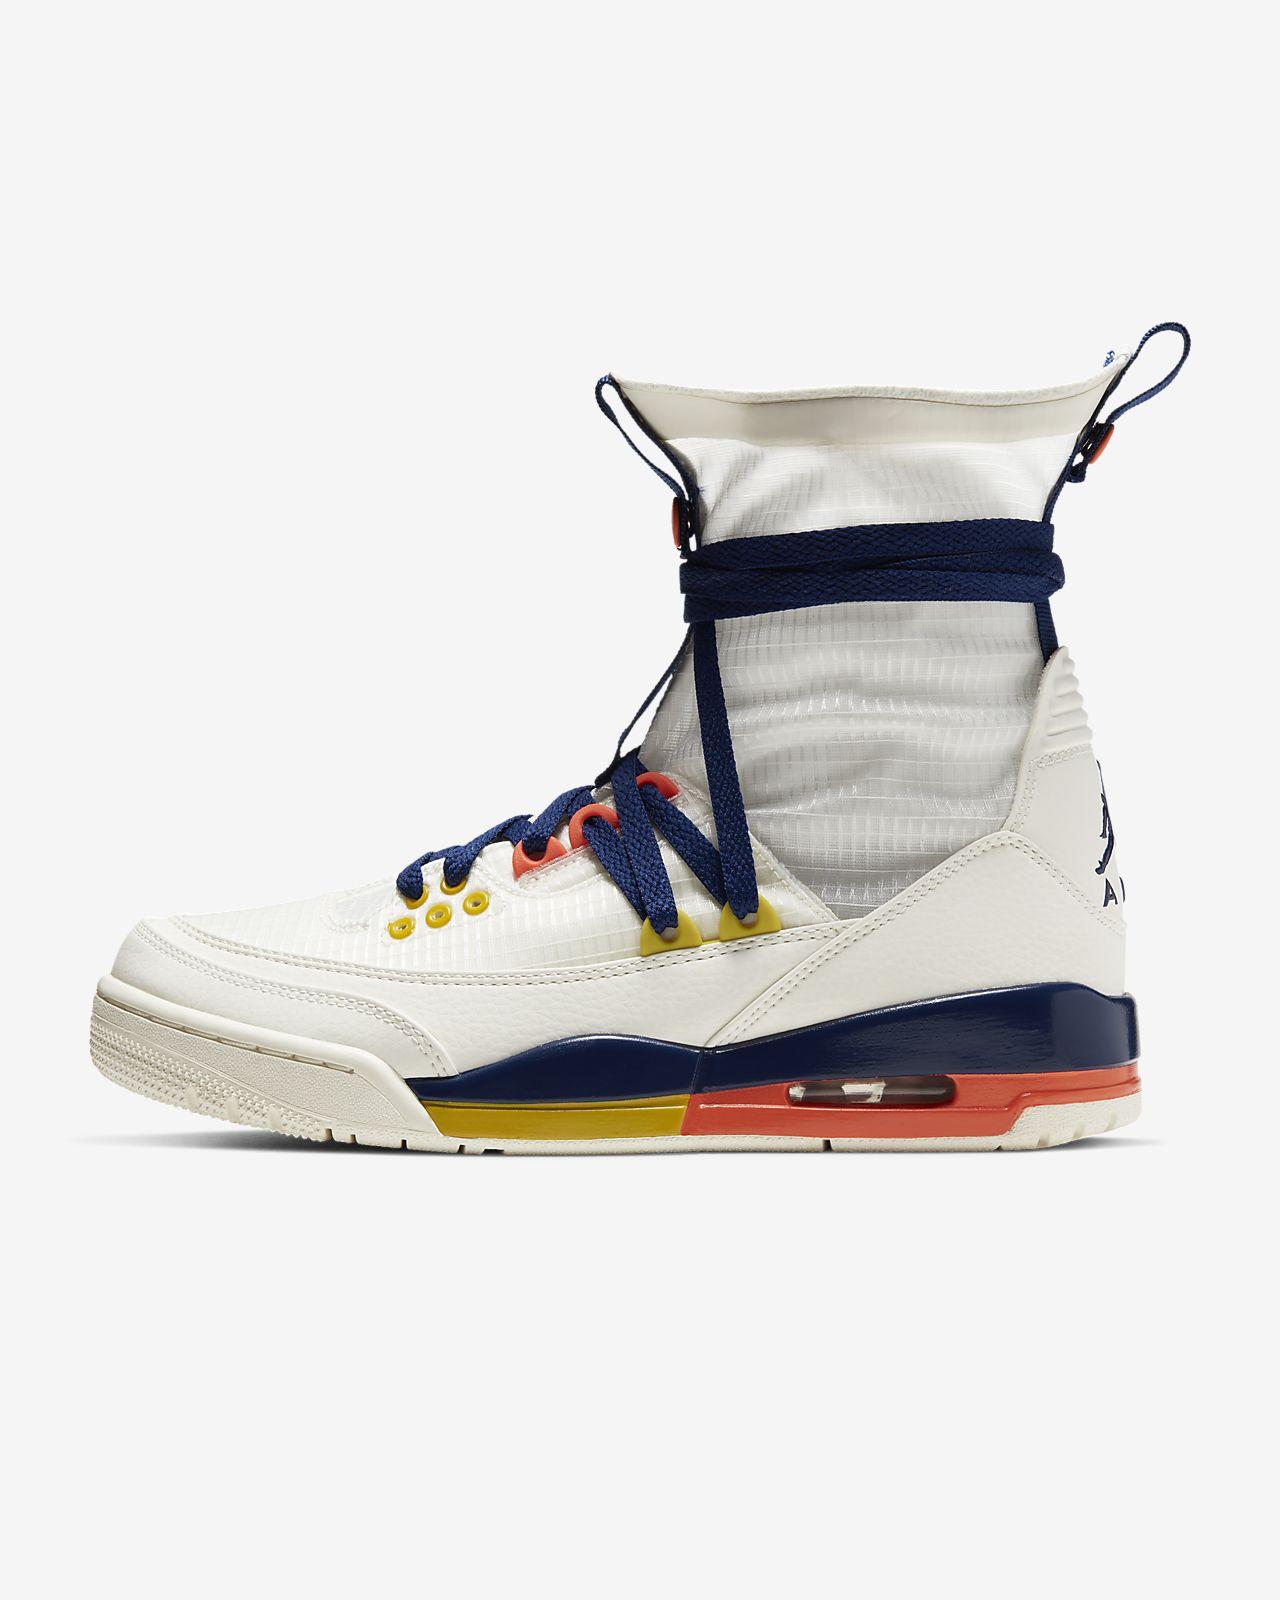 eacc89d3abeab1 Air Jordan 3 Retro Explorer Lite XX Women s Shoe. Nike.com